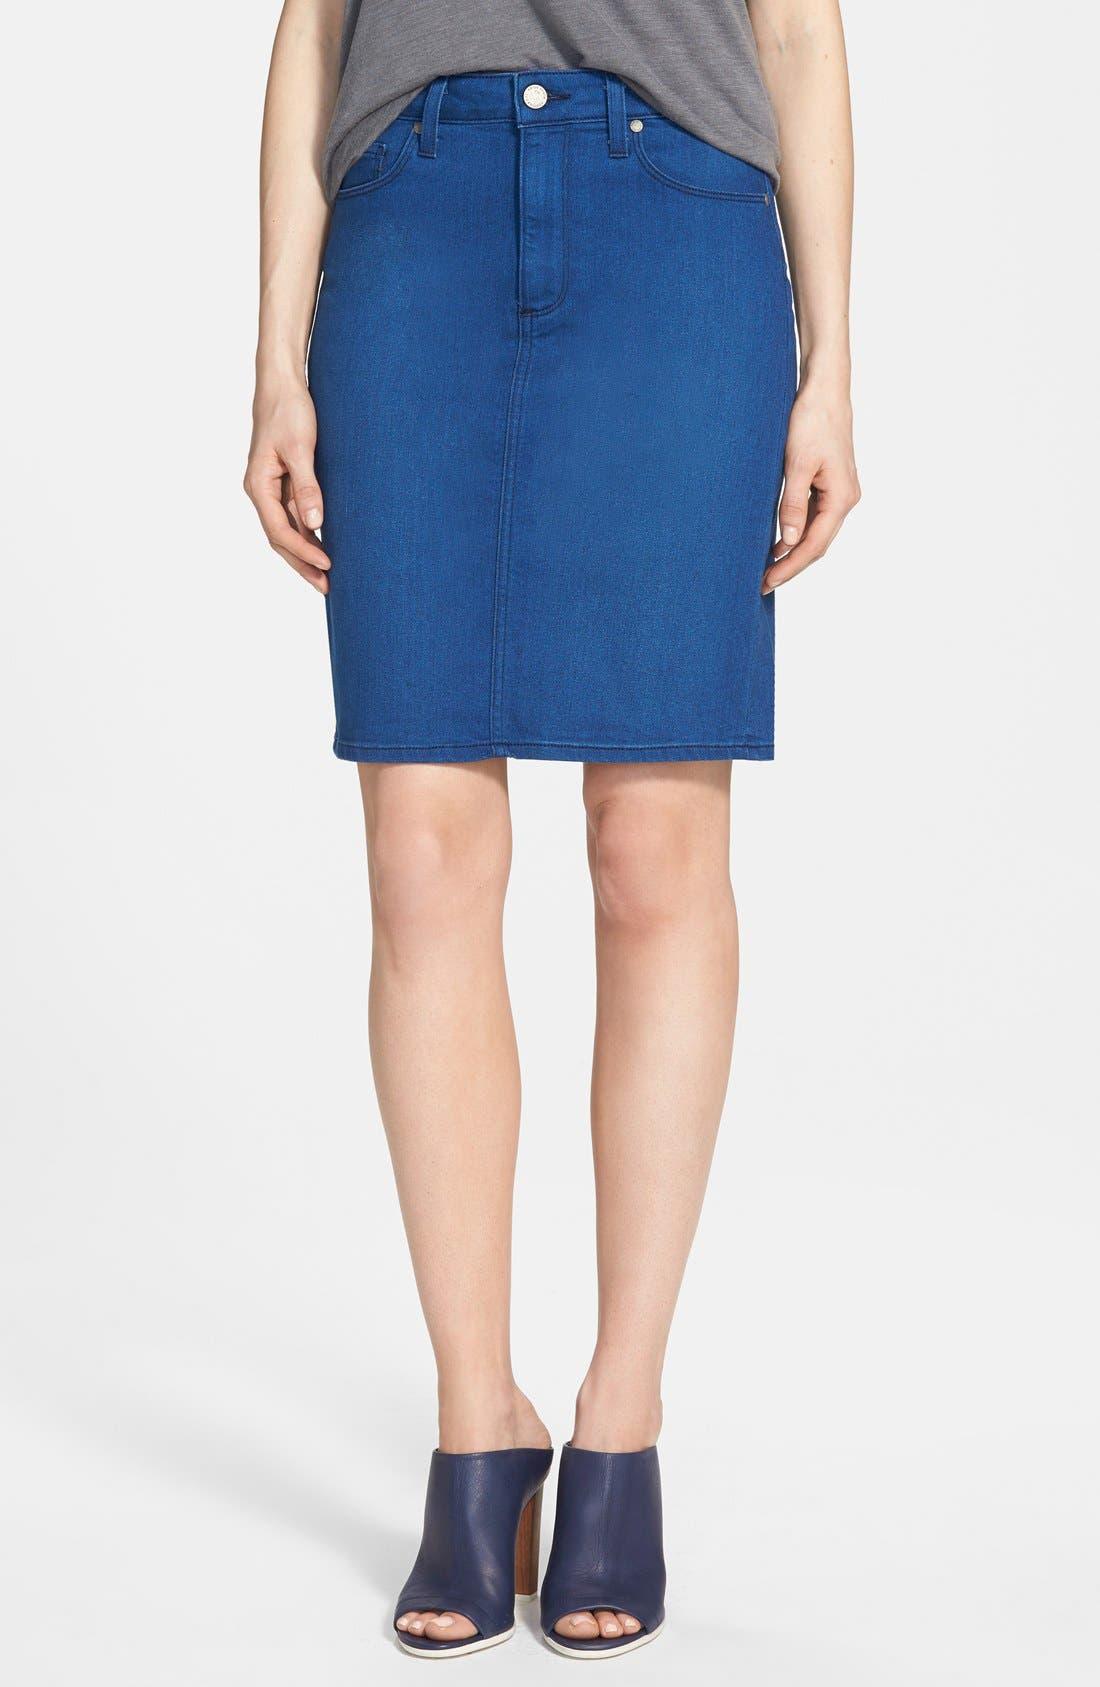 Alternate Image 1 Selected - Paige Denim 'Deirdre' Denim Pencil Skirt (Frenchie No Whiskers)